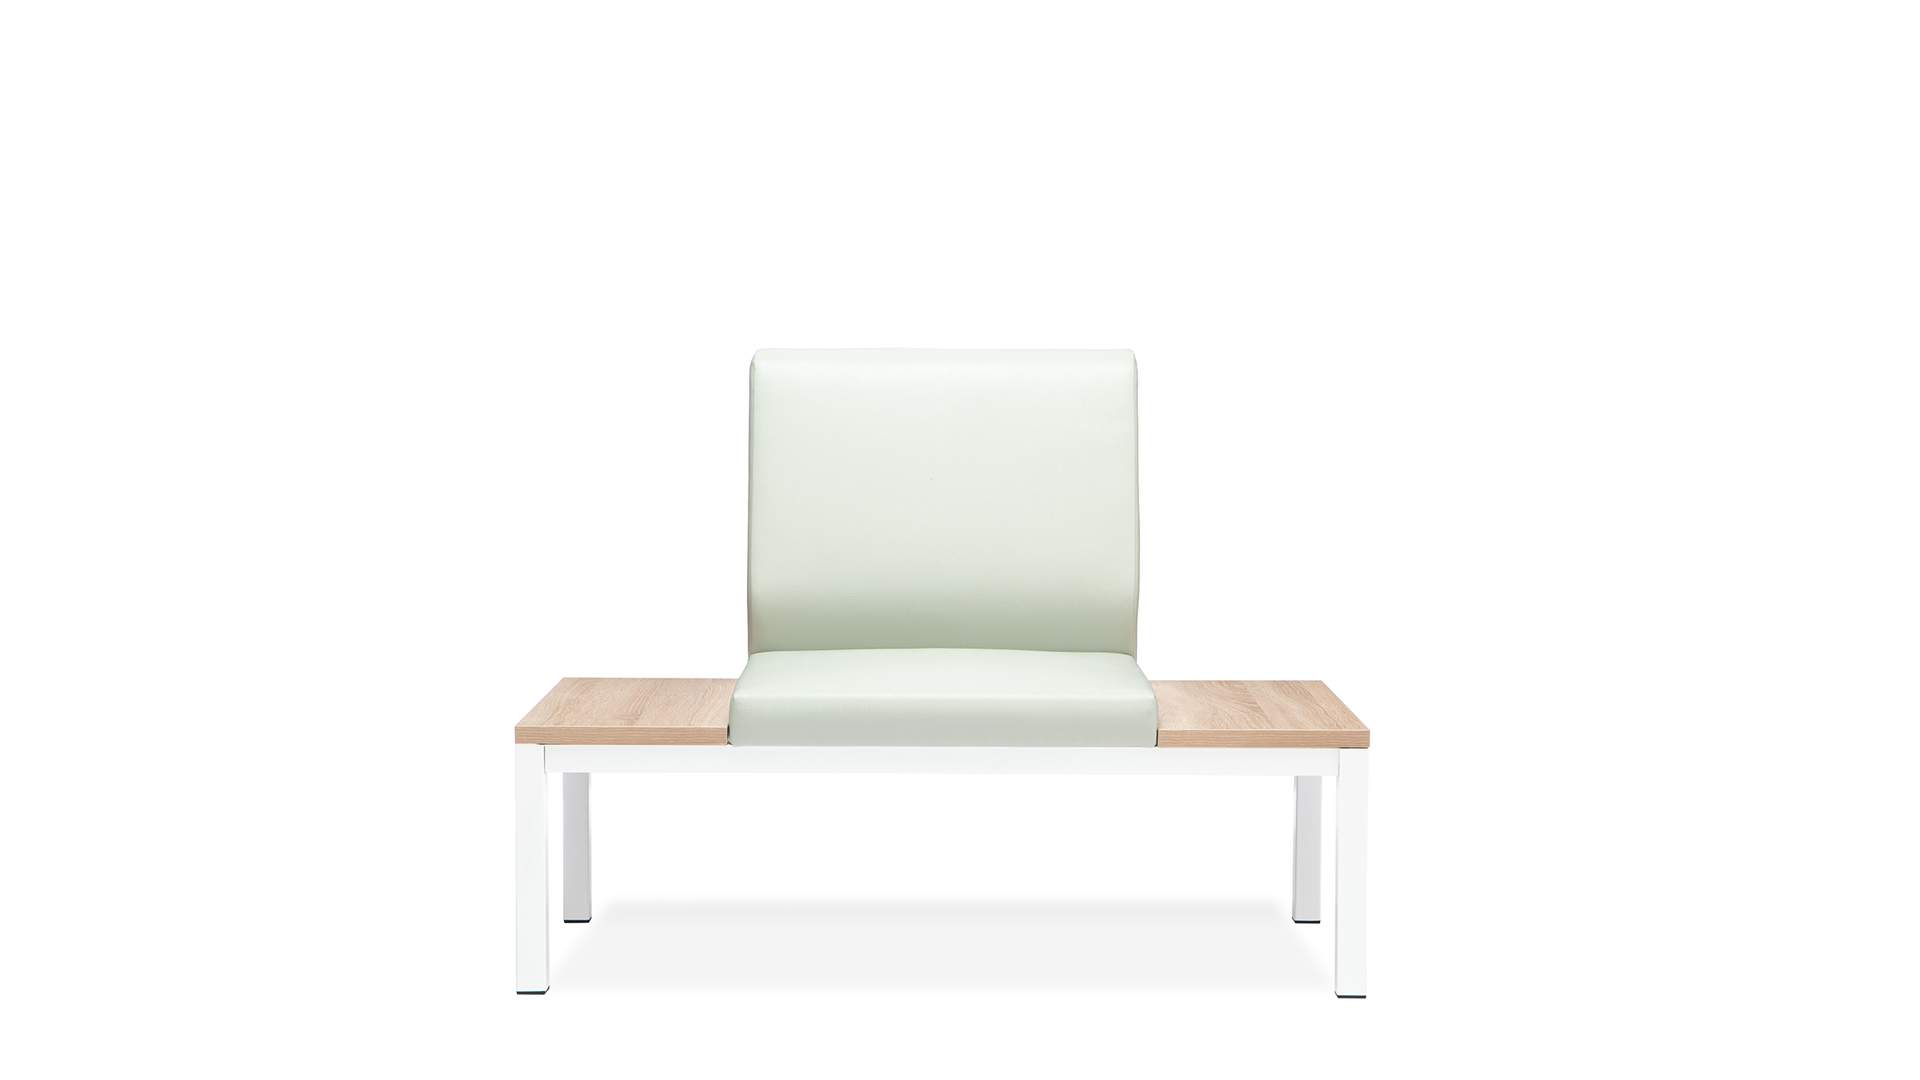 Кресло одноместное без п\л с 2мя столиками  Норман 1200x660x890